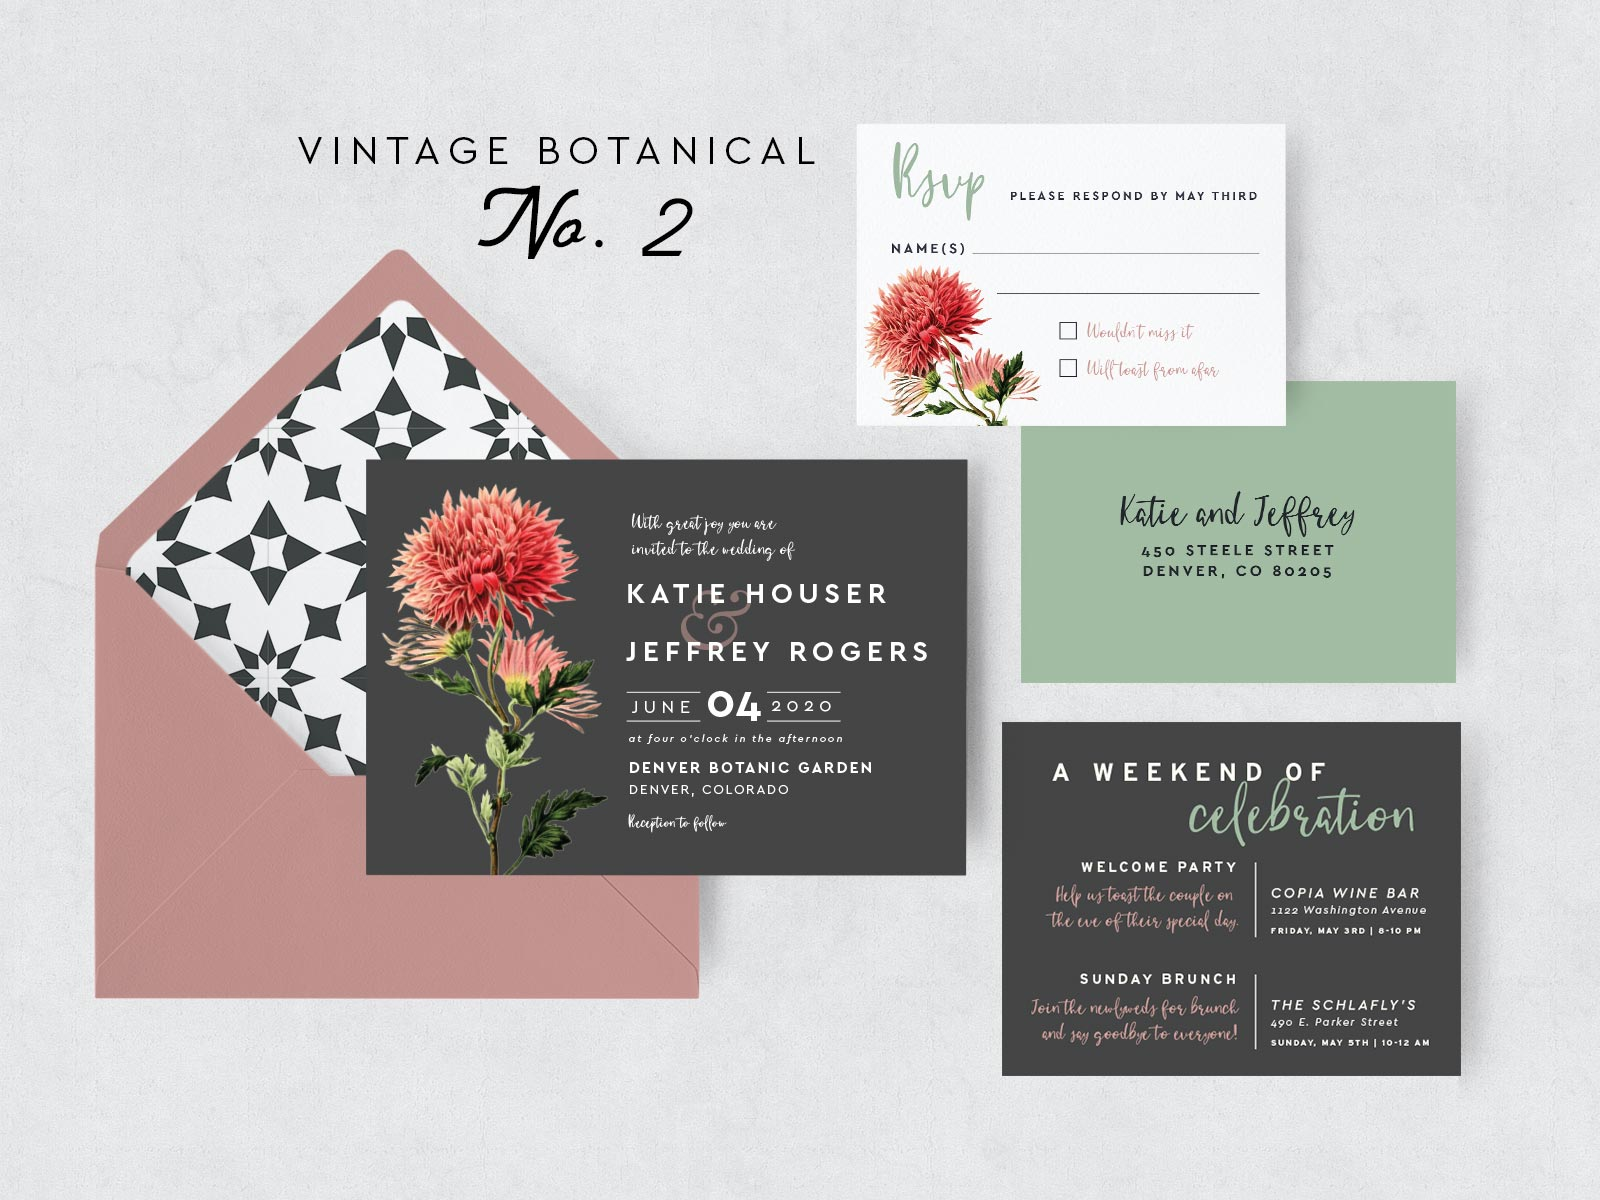 vintage-botanical-2.jpg